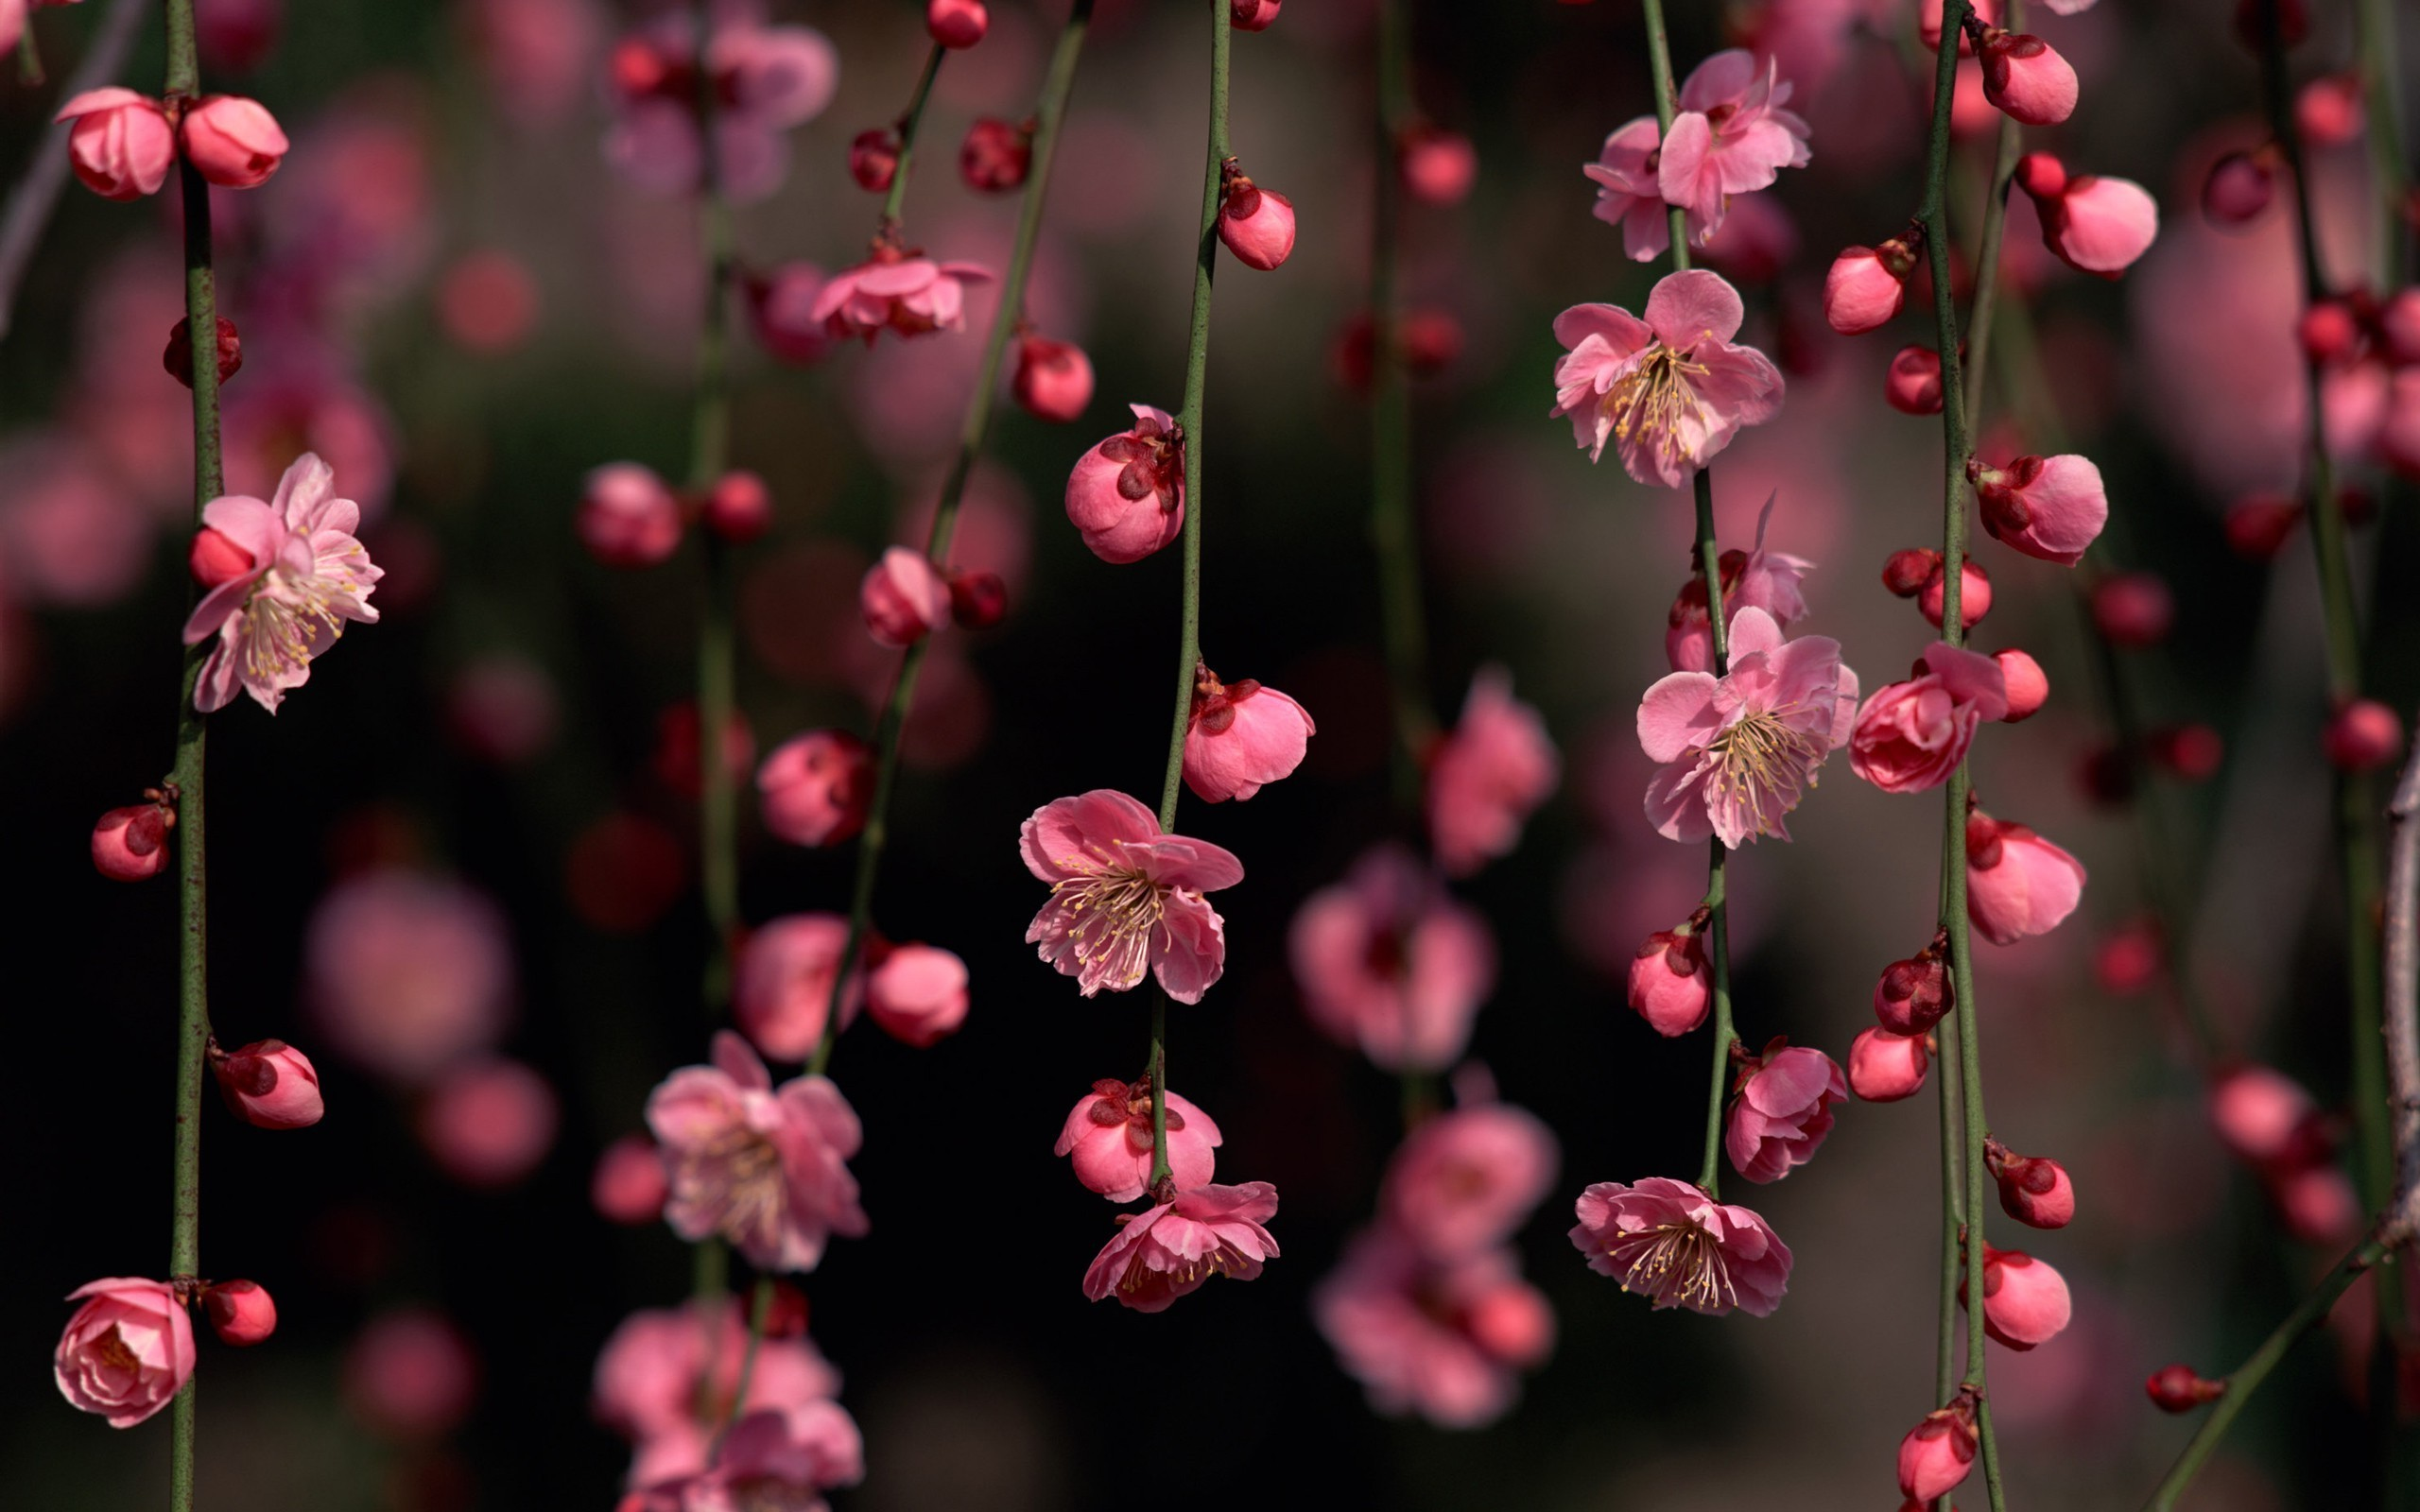 Cool Blossom Wallpaper